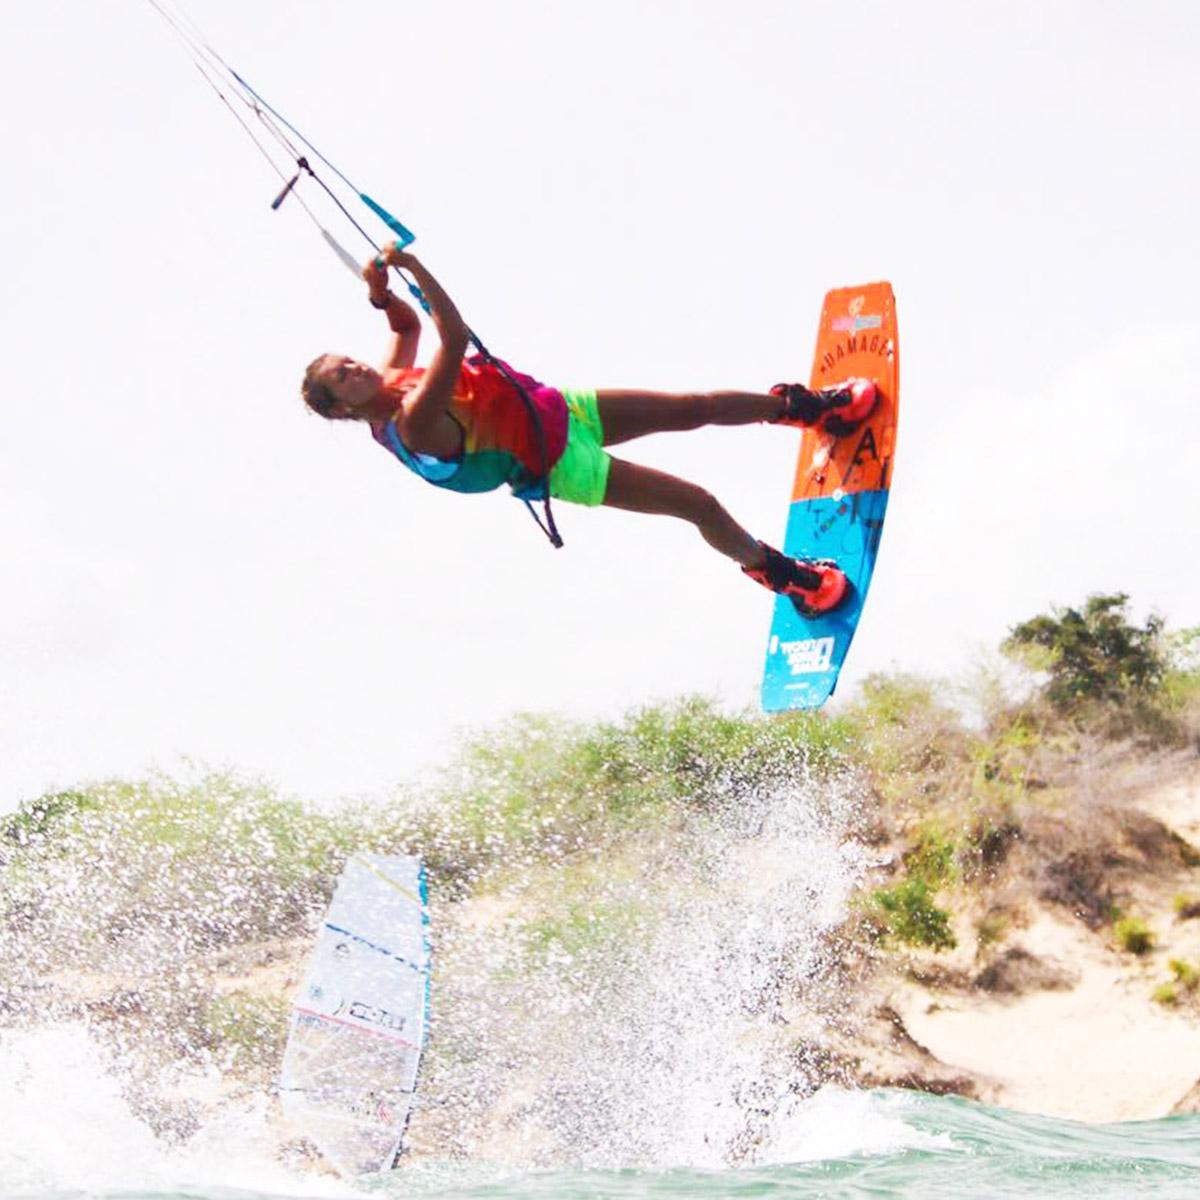 liloo-gringa-weridelocal-malavita-team-rider-kitesurf-9